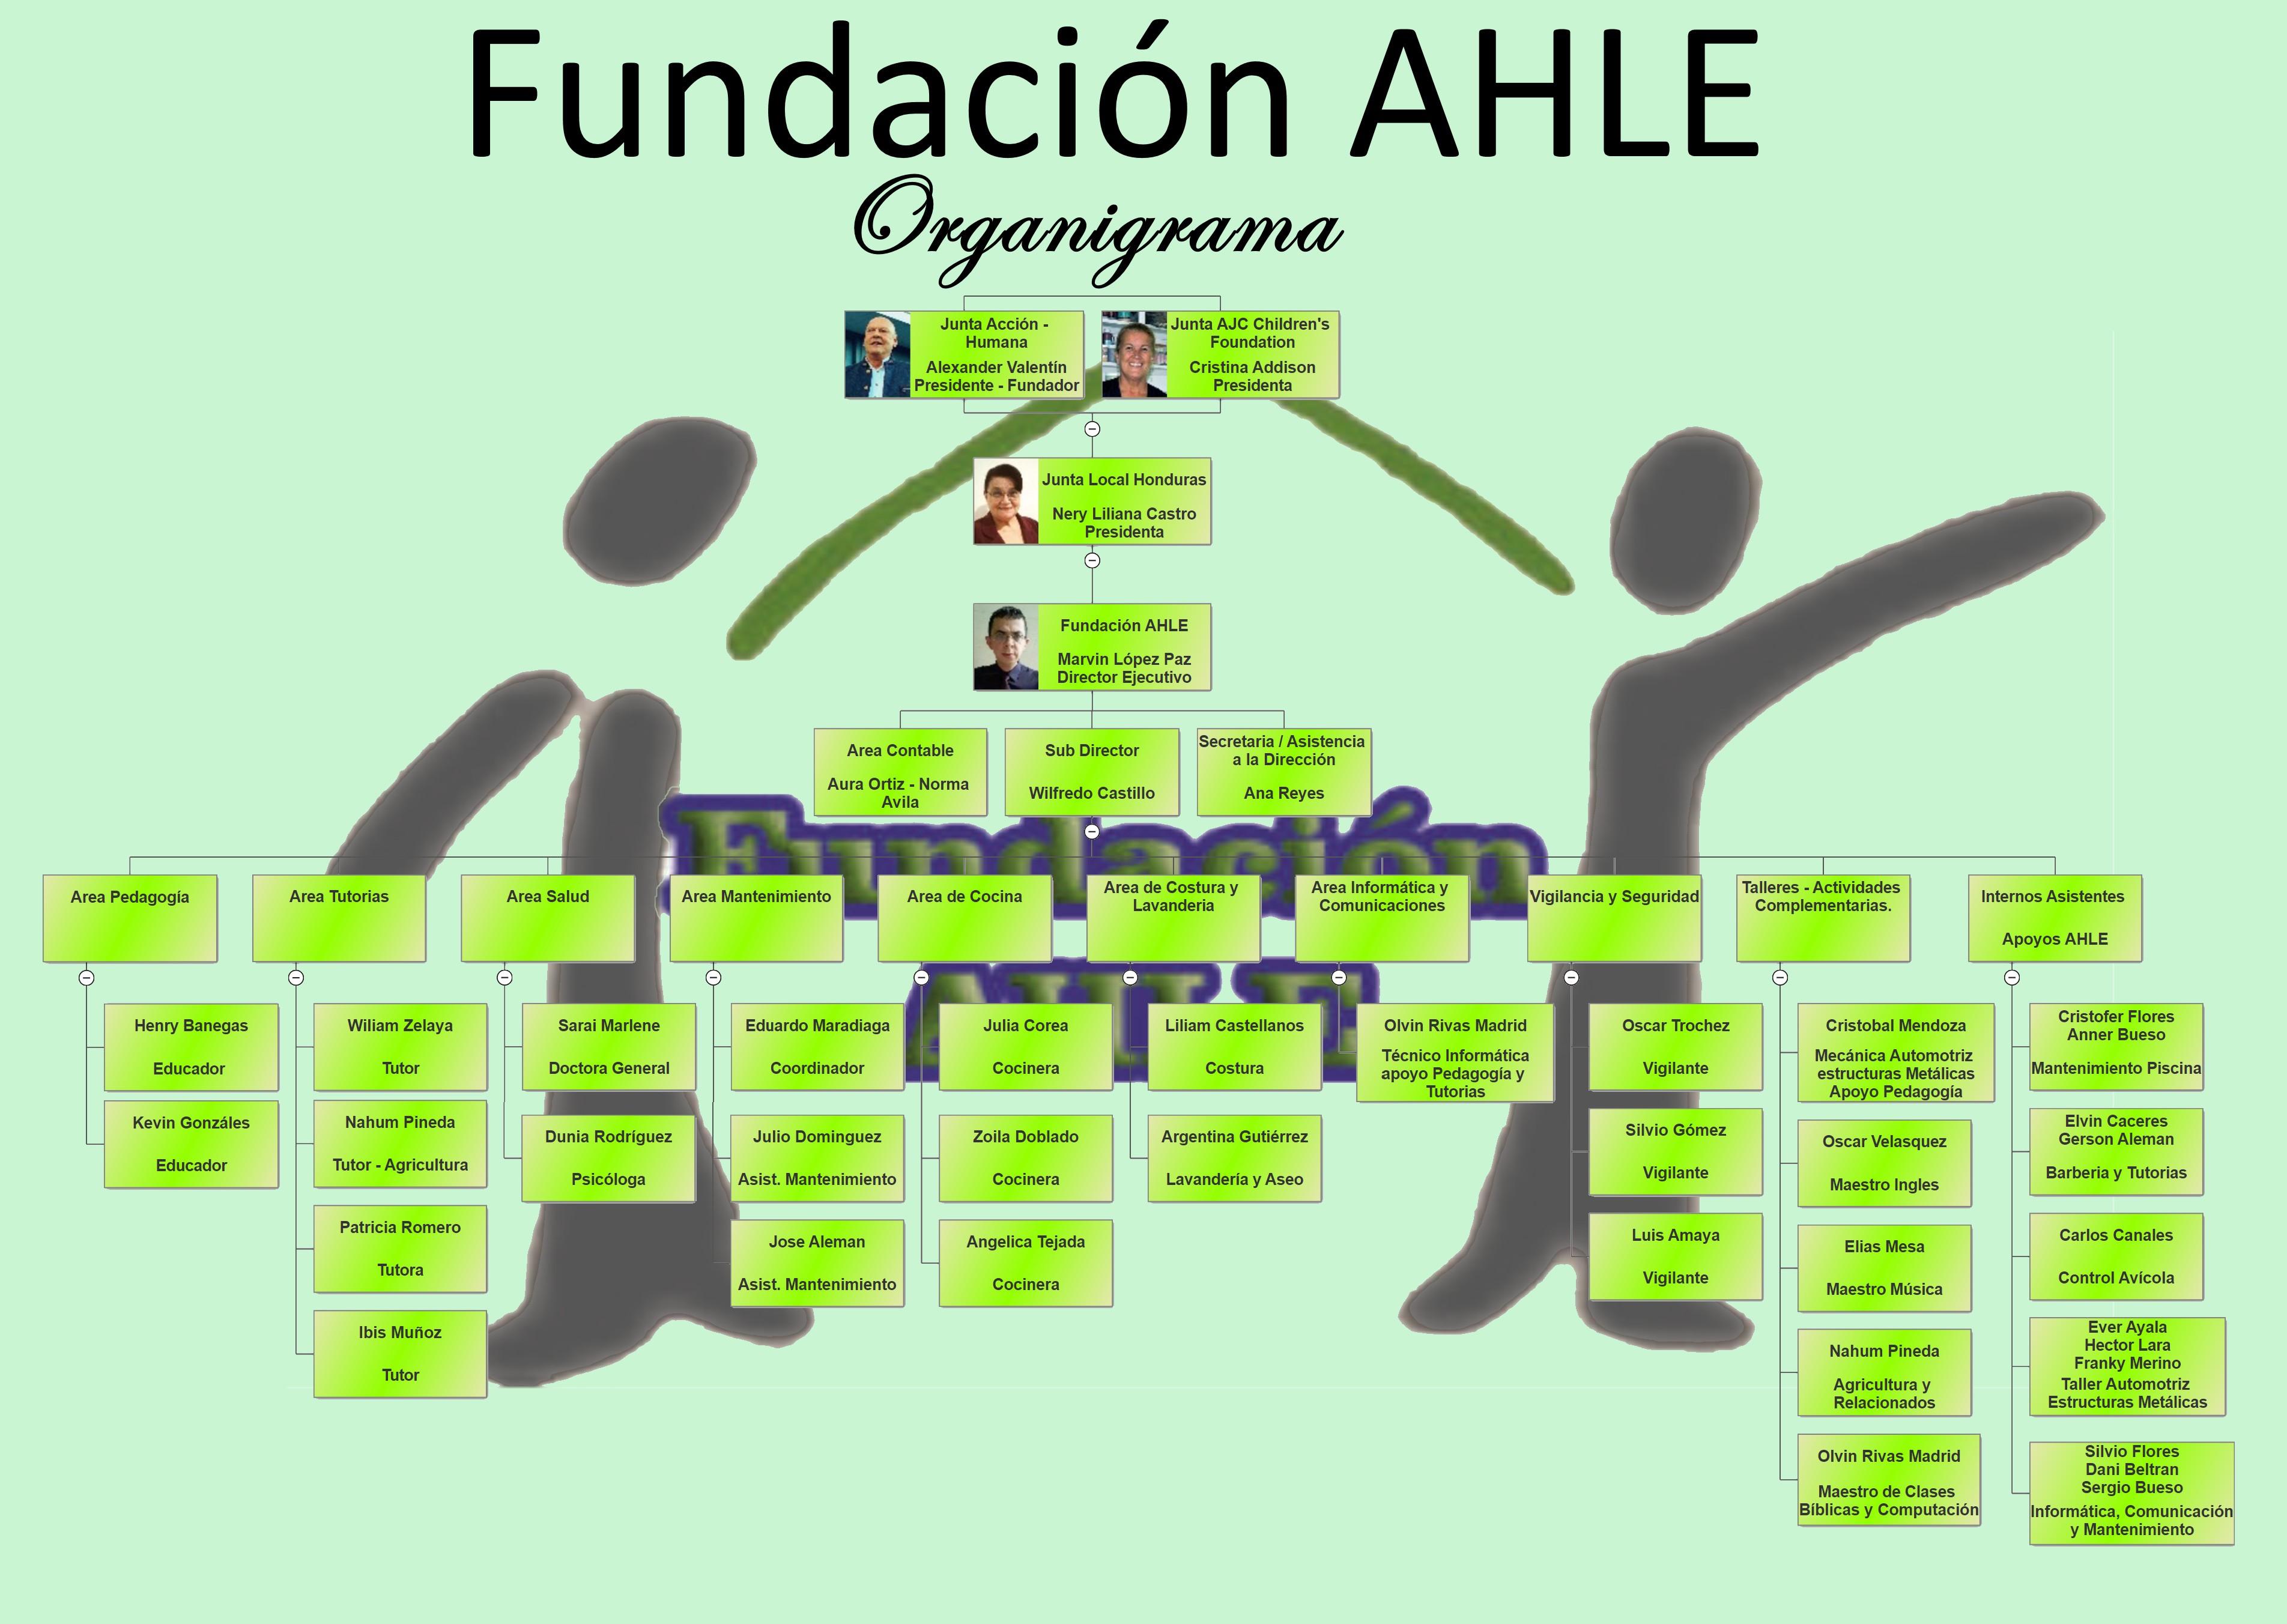 Organigramm AHLE